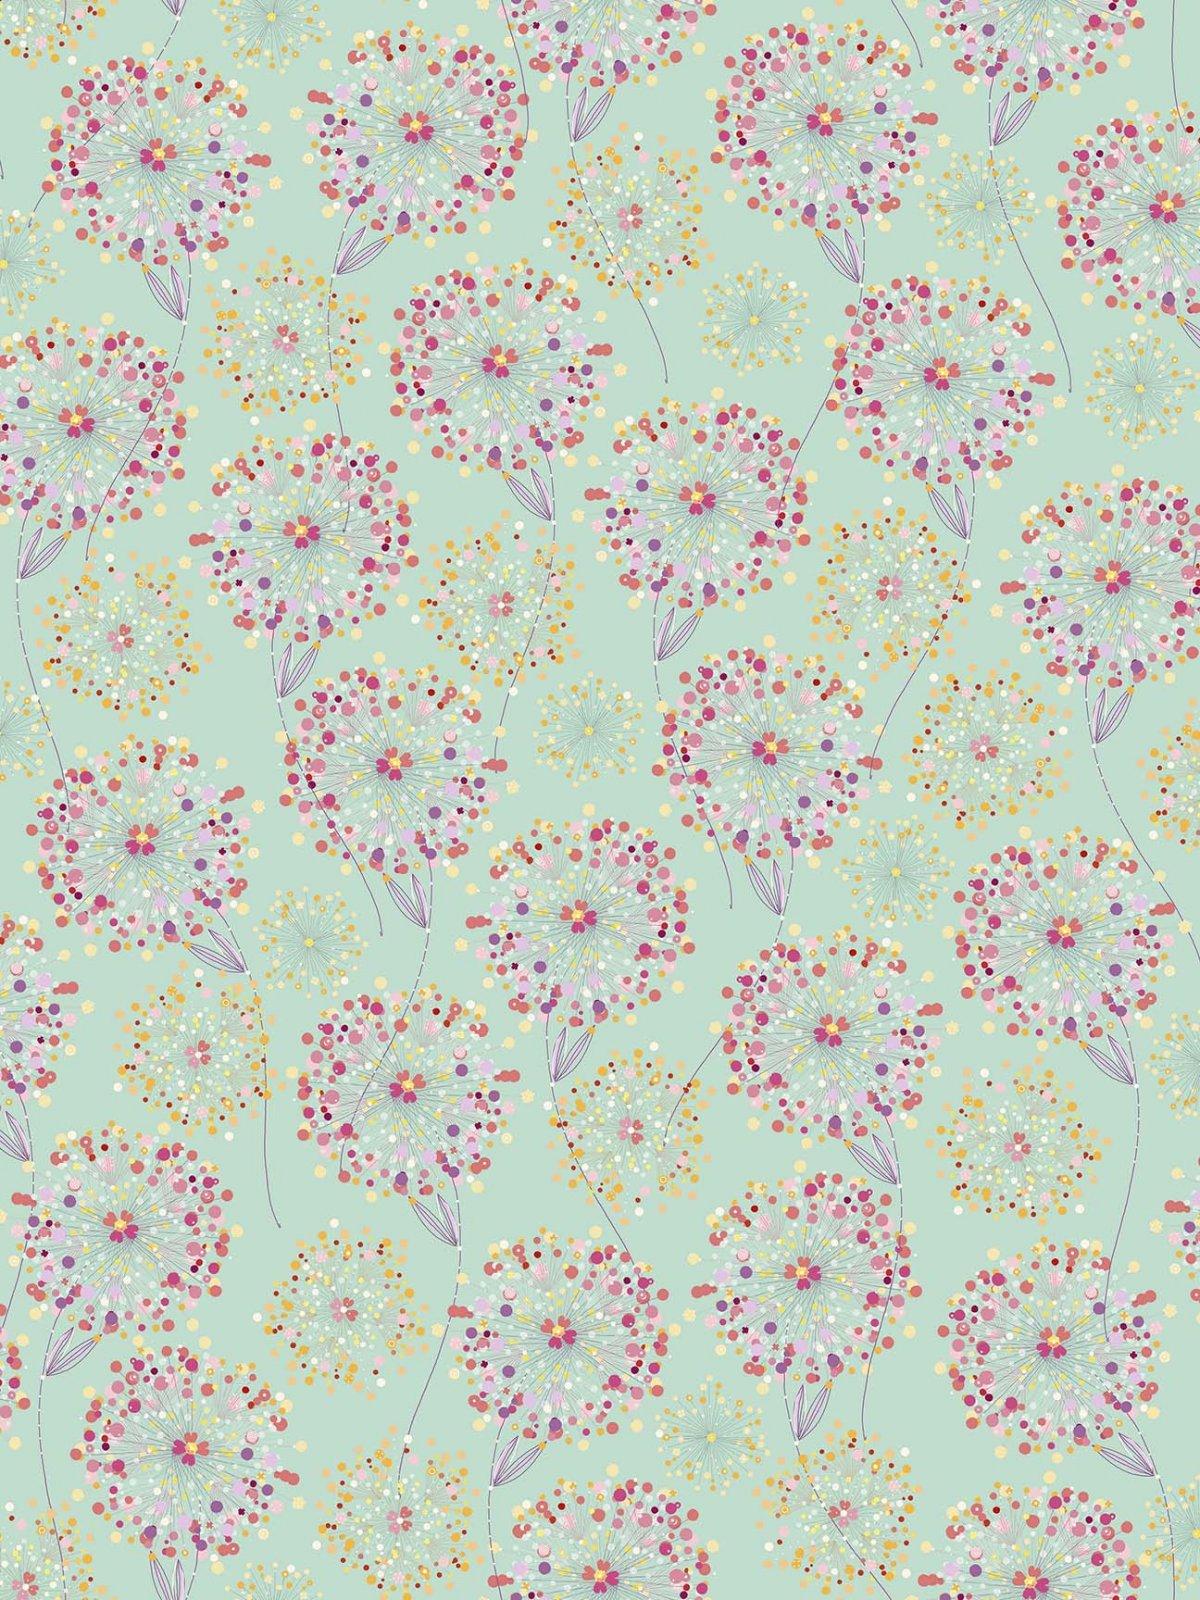 Confetti Blossoms Packed - Medium Seafoam